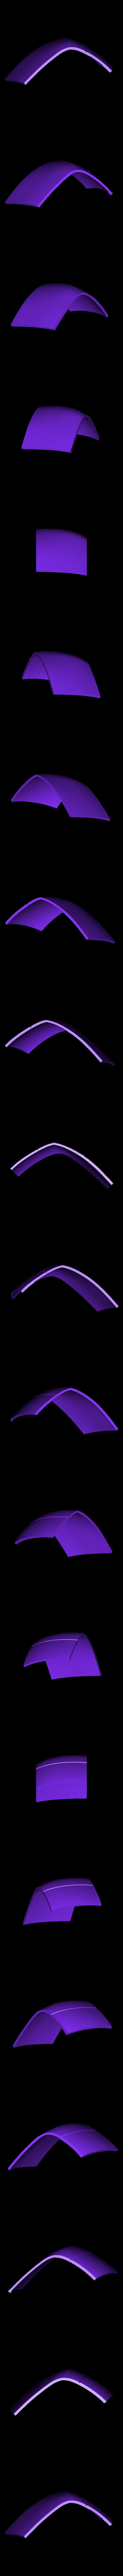 Part_6_v2.stl Download free STL file Red Hood Helmet (Batman) with Details • Template to 3D print, VillainousPropShop